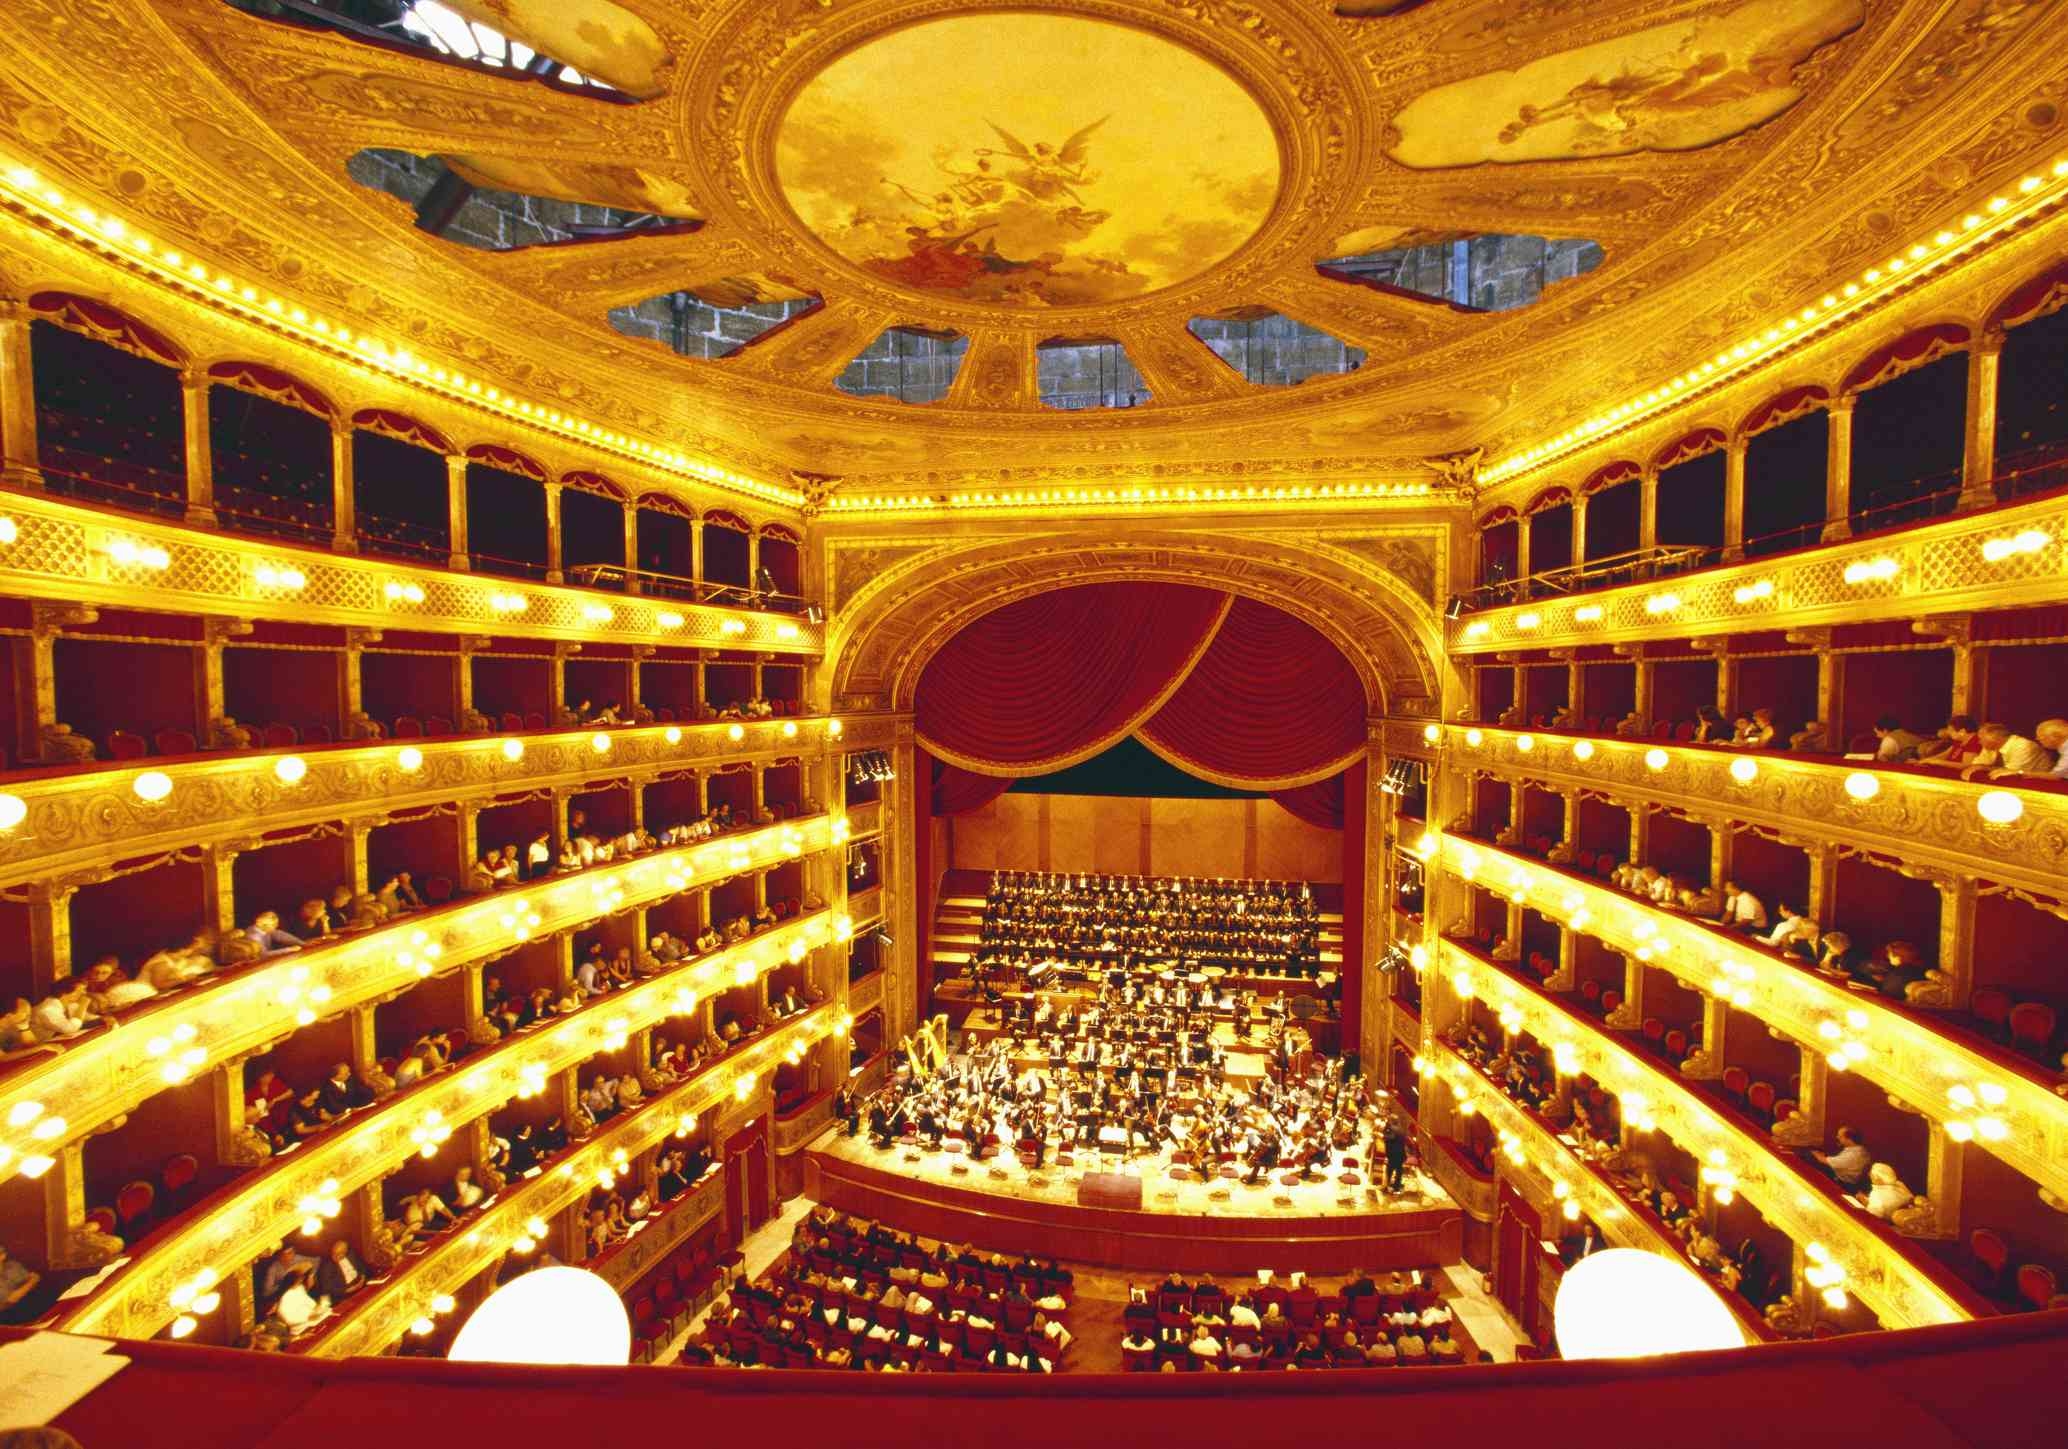 Sicily - Teatro Massimo Interior